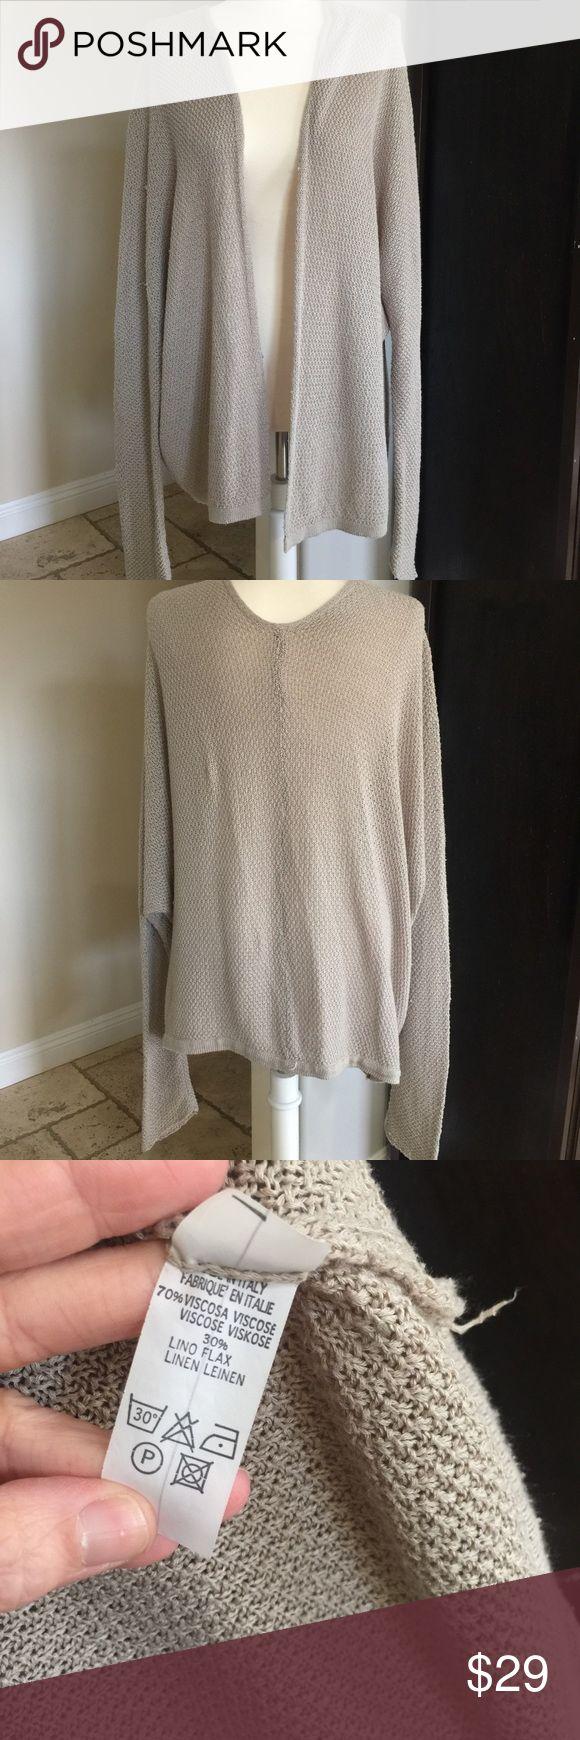 Brandy Melville cardigan Tan, open front, knit, over sized, one size. Brandy Melville Sweaters Cardigans